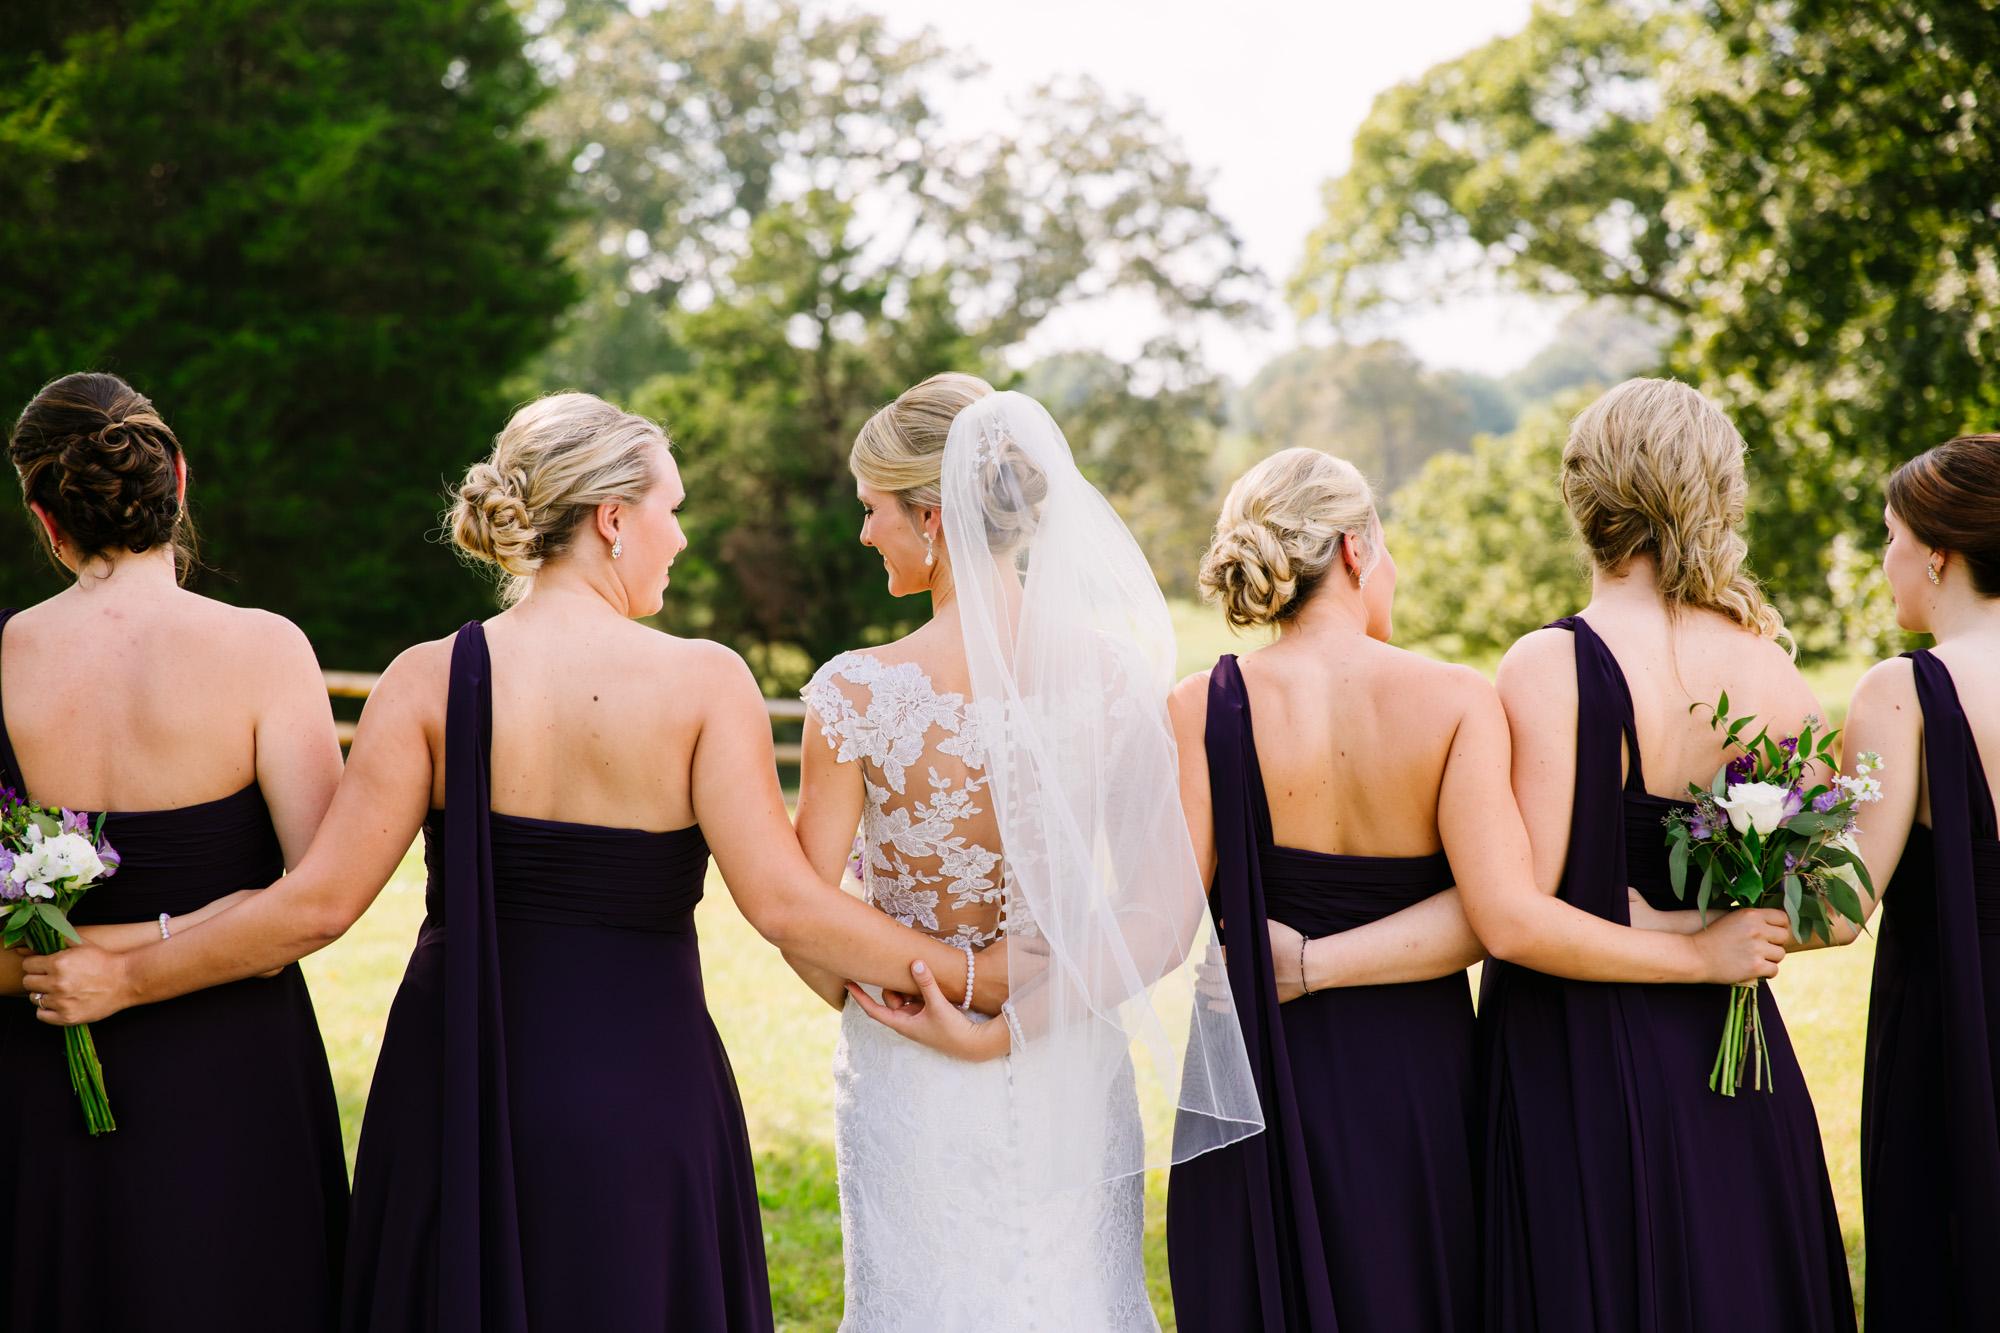 Waynesville, NC Wedding Photography | Bride and Bridesmaids Interlocking Arms